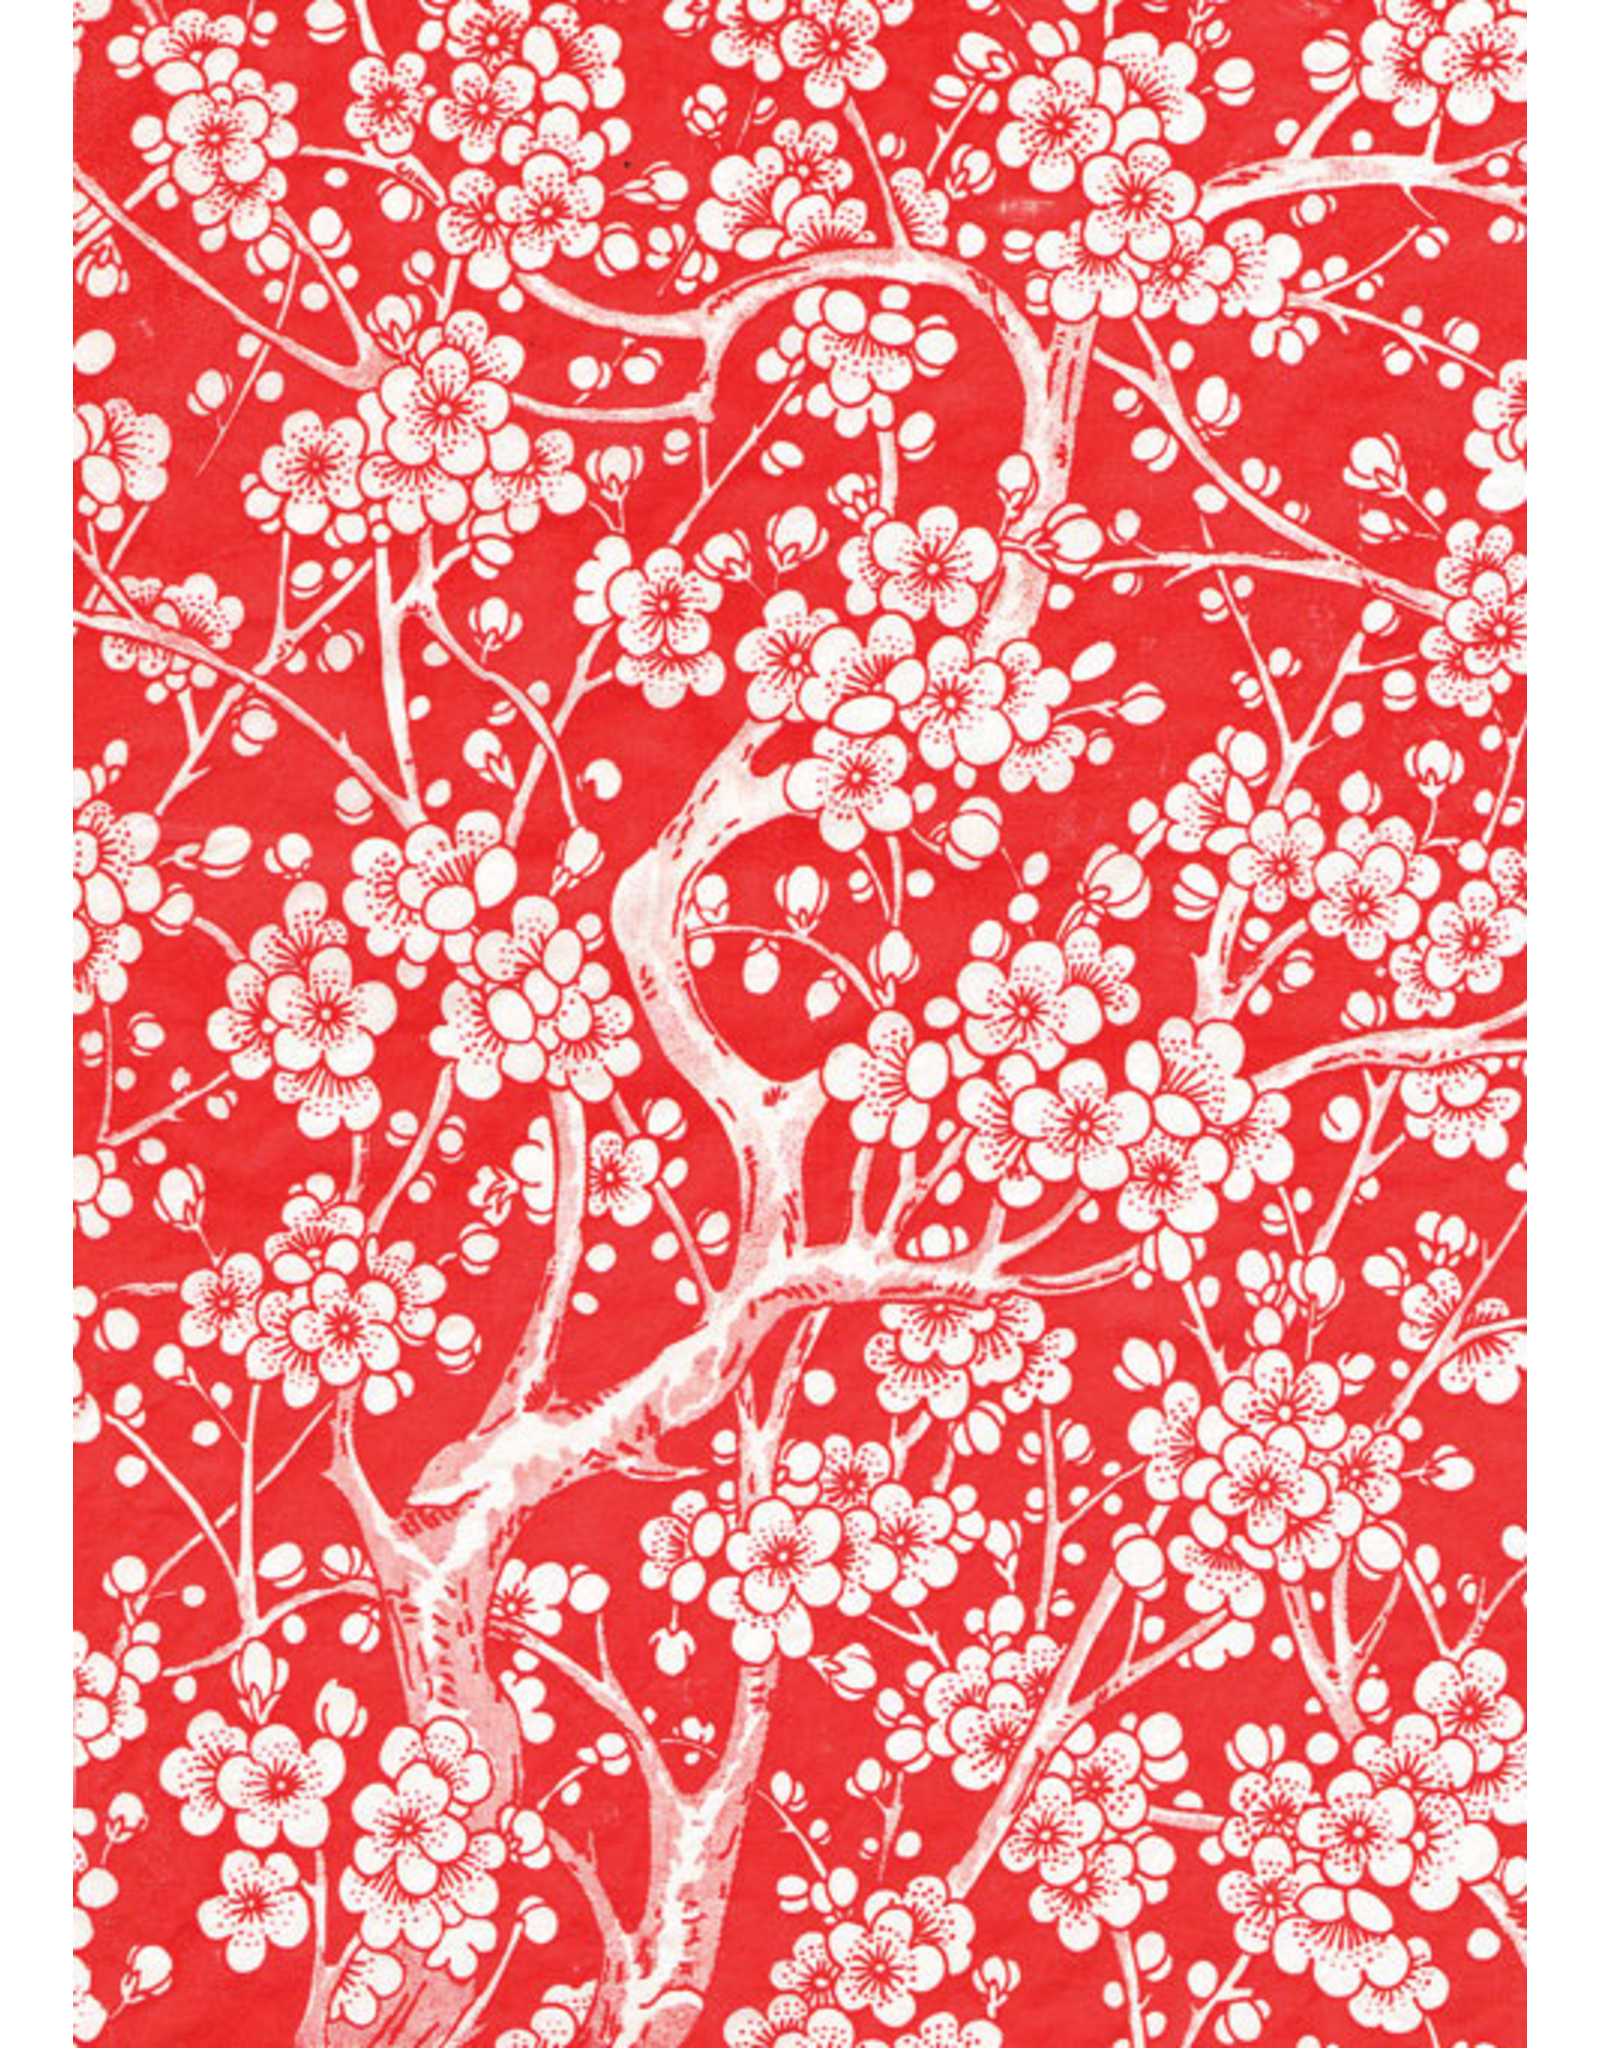 Sanbao Cherry flower decal 2